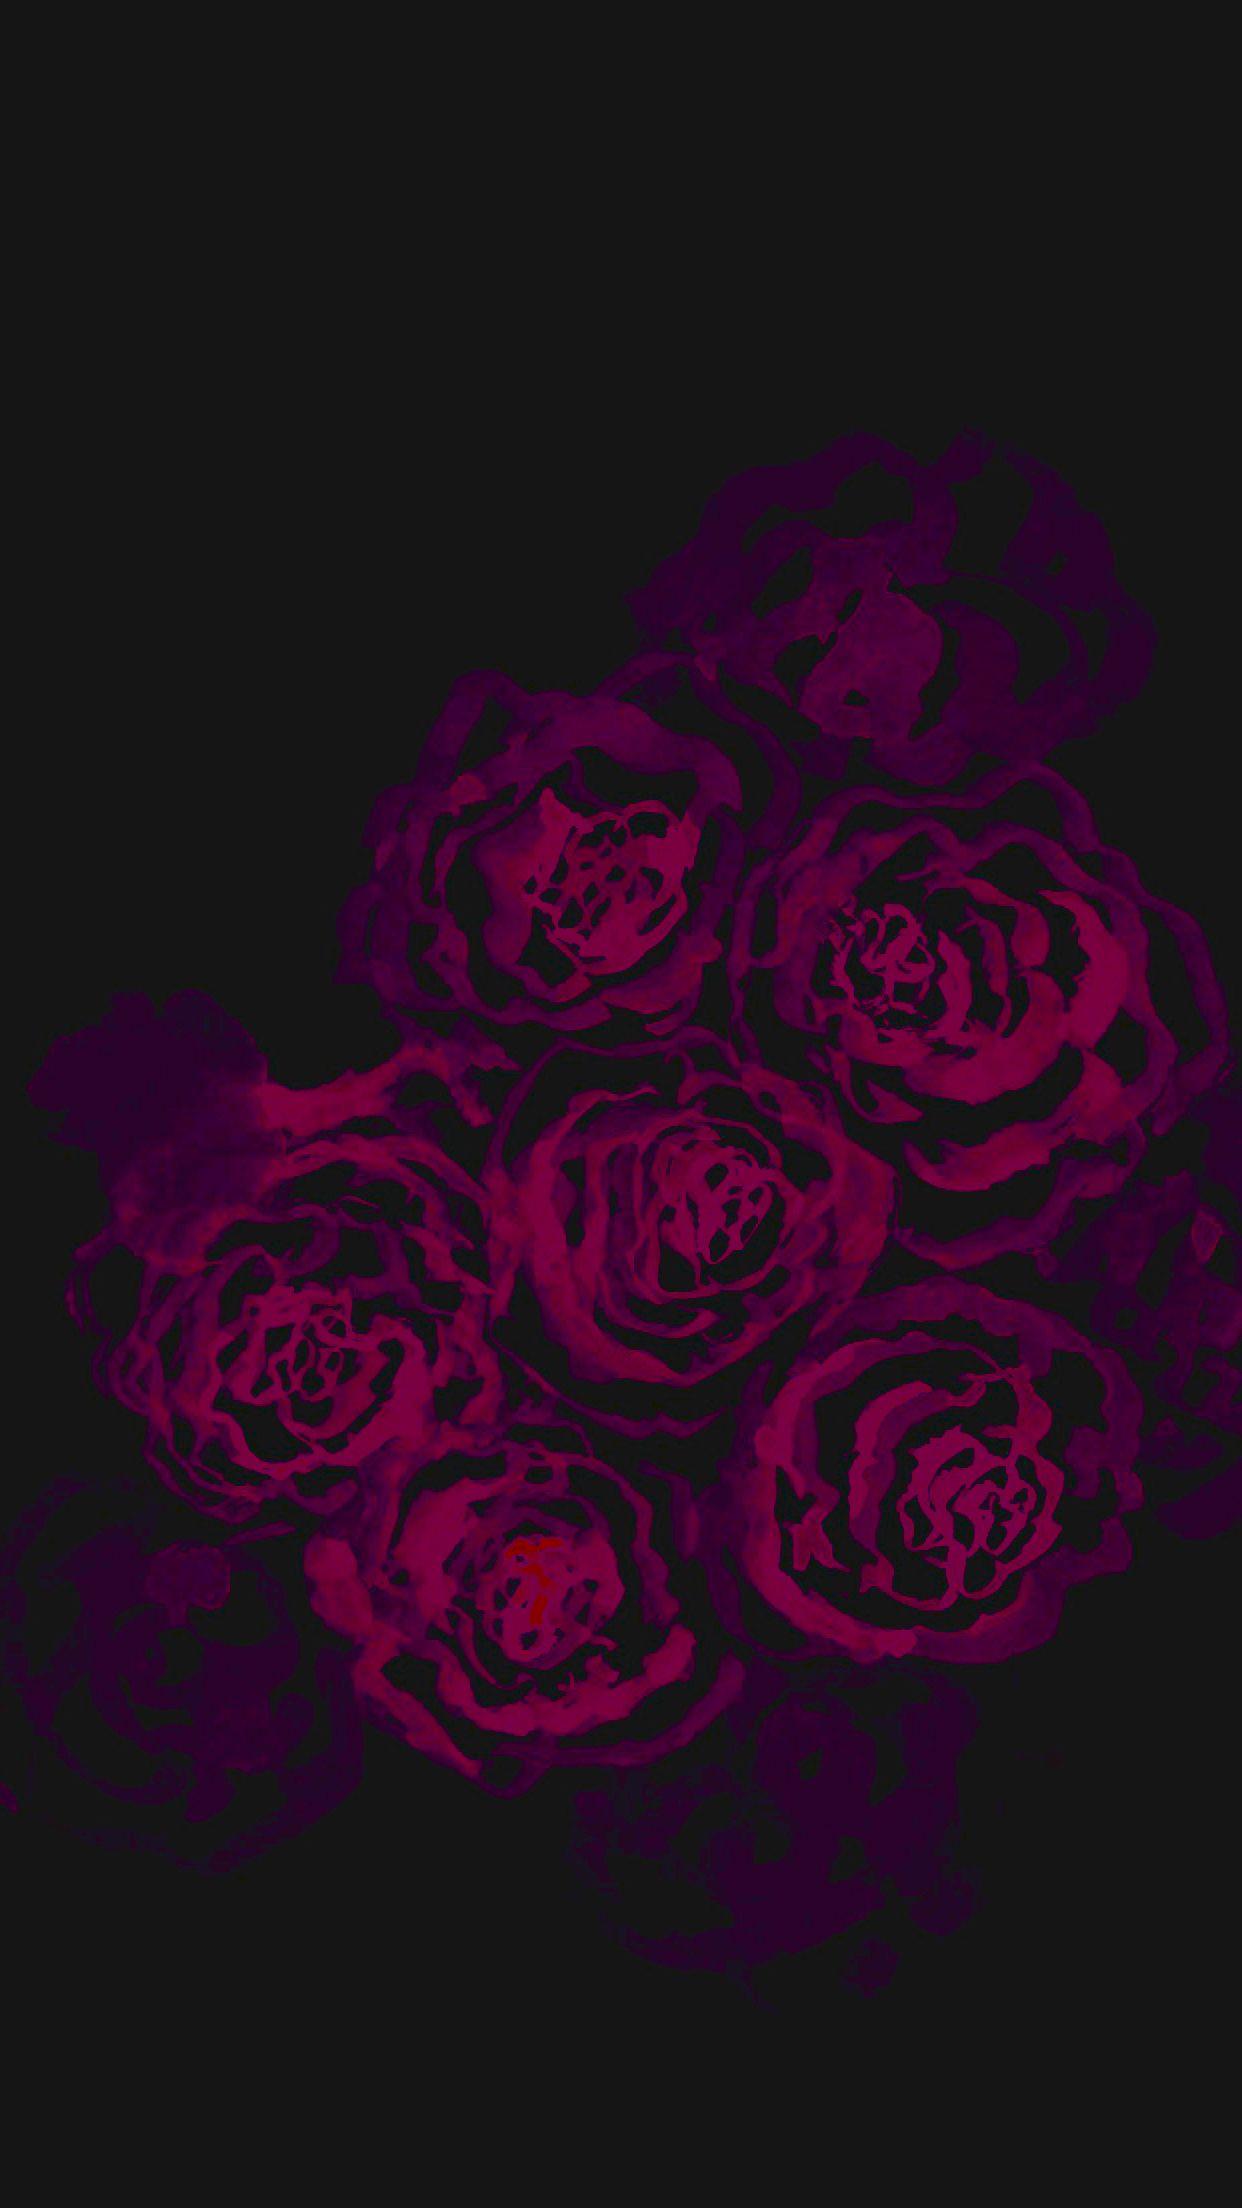 Lock Screen Red Rose Black Background Wallpaper